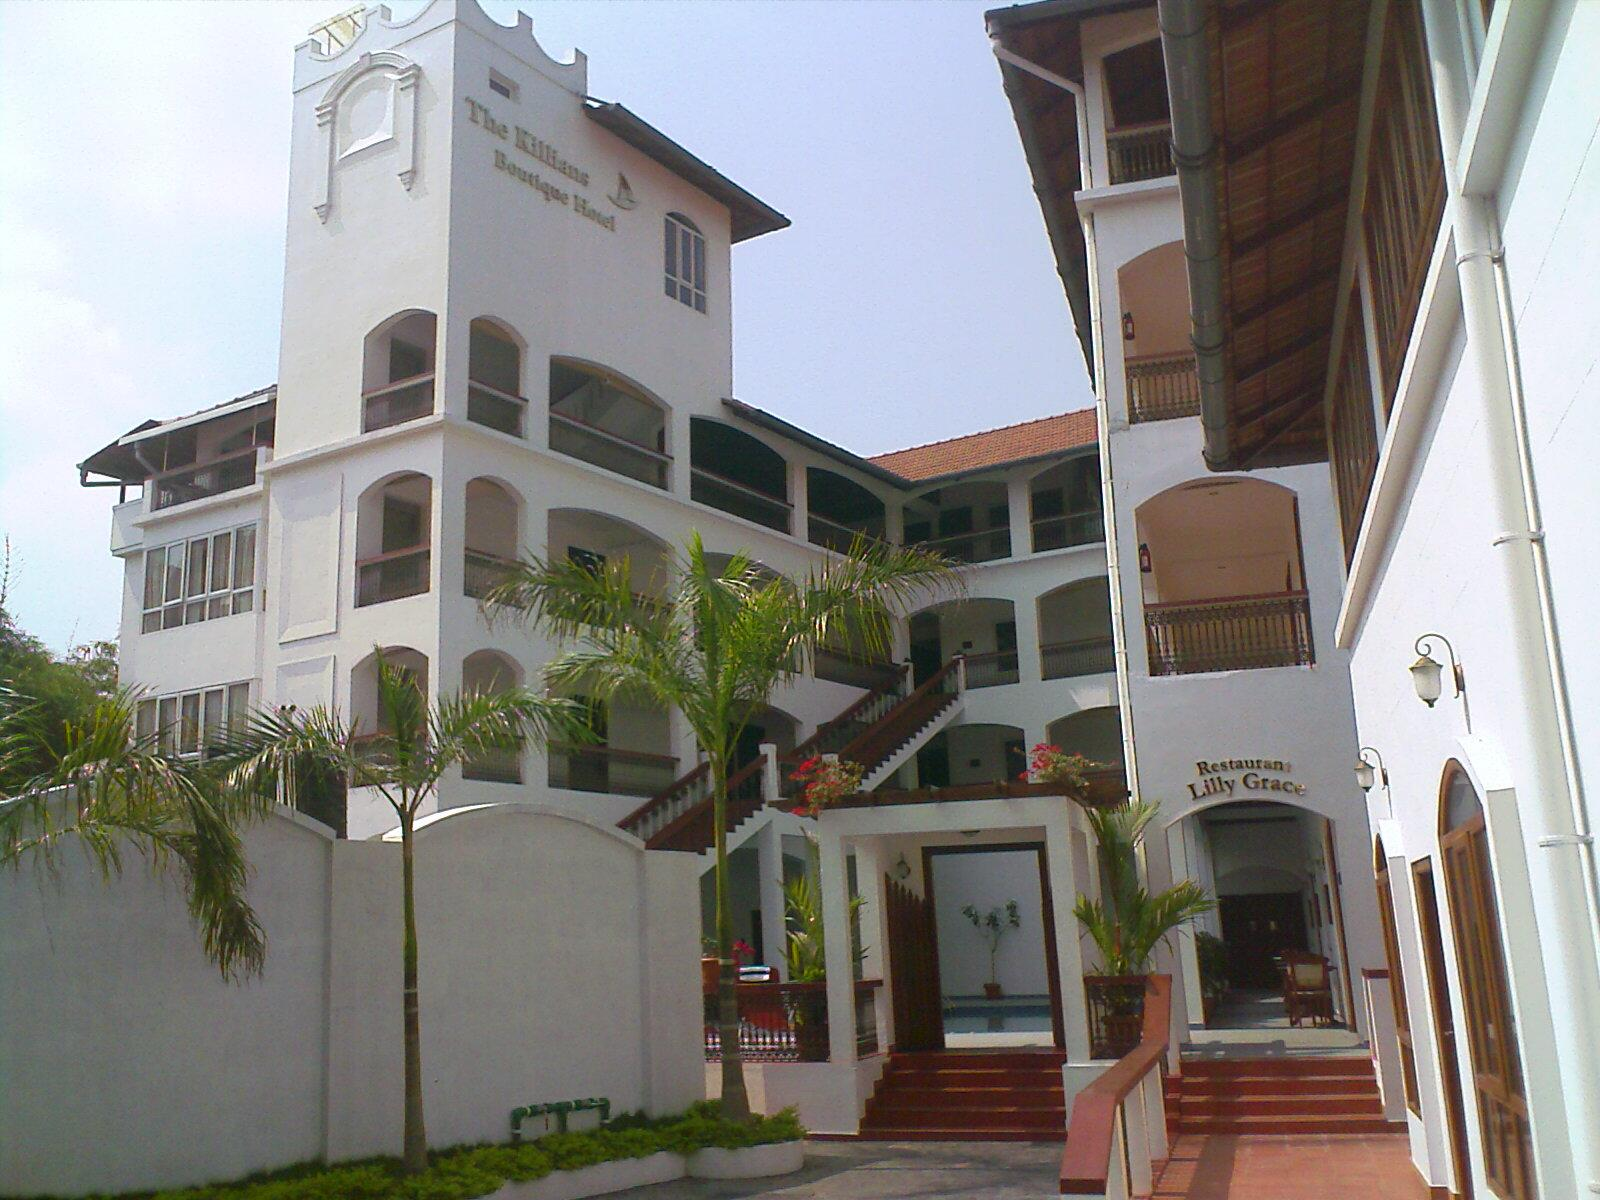 The Killians Boutique Hotel - Hotell och Boende i Indien i Kochi / Cochin